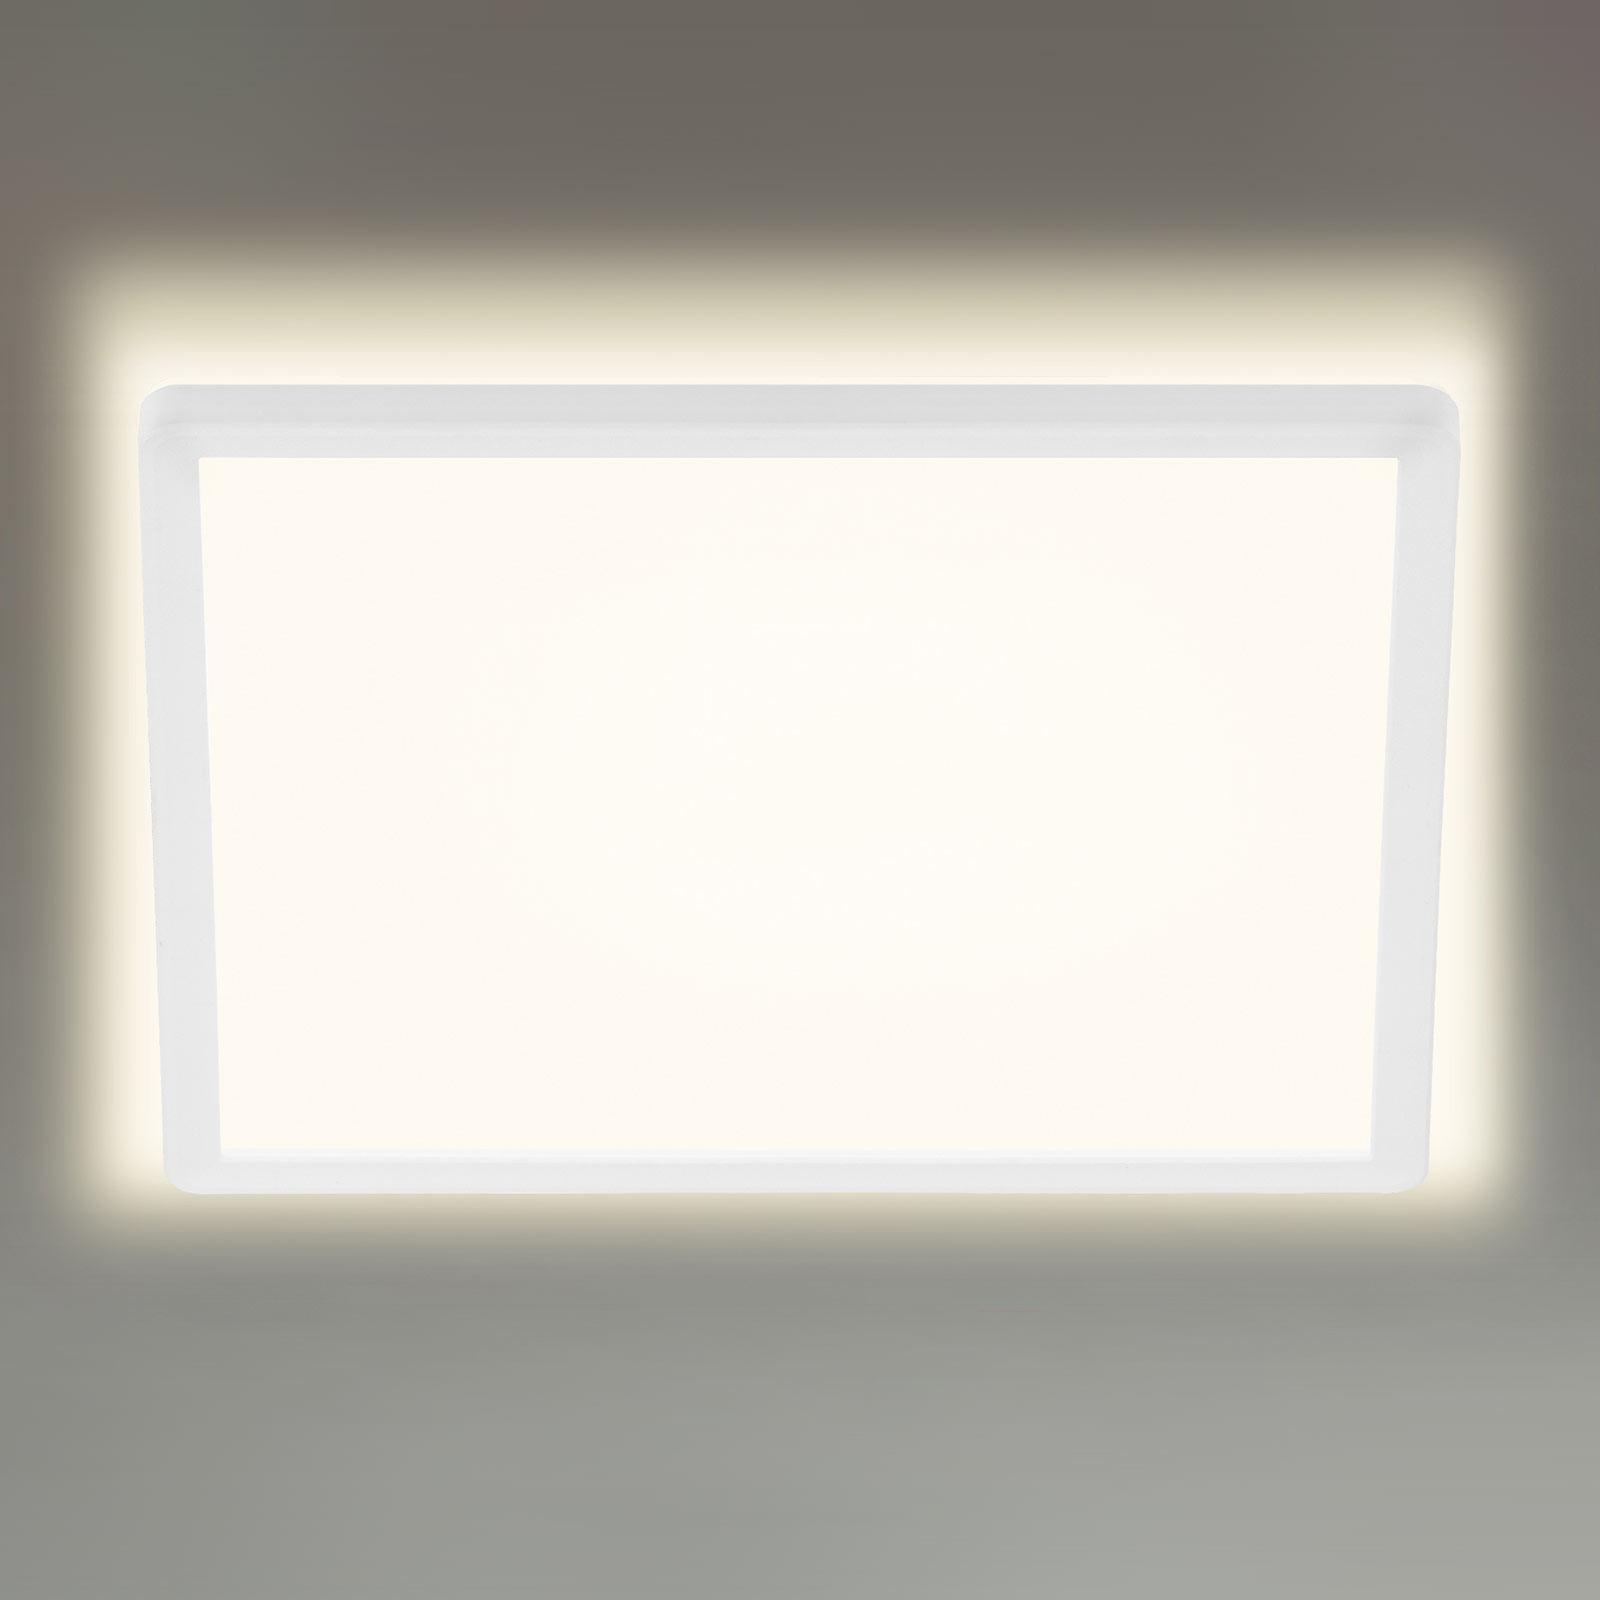 LED-taklampe 7156/7158, kantet 29,3x29,3cm